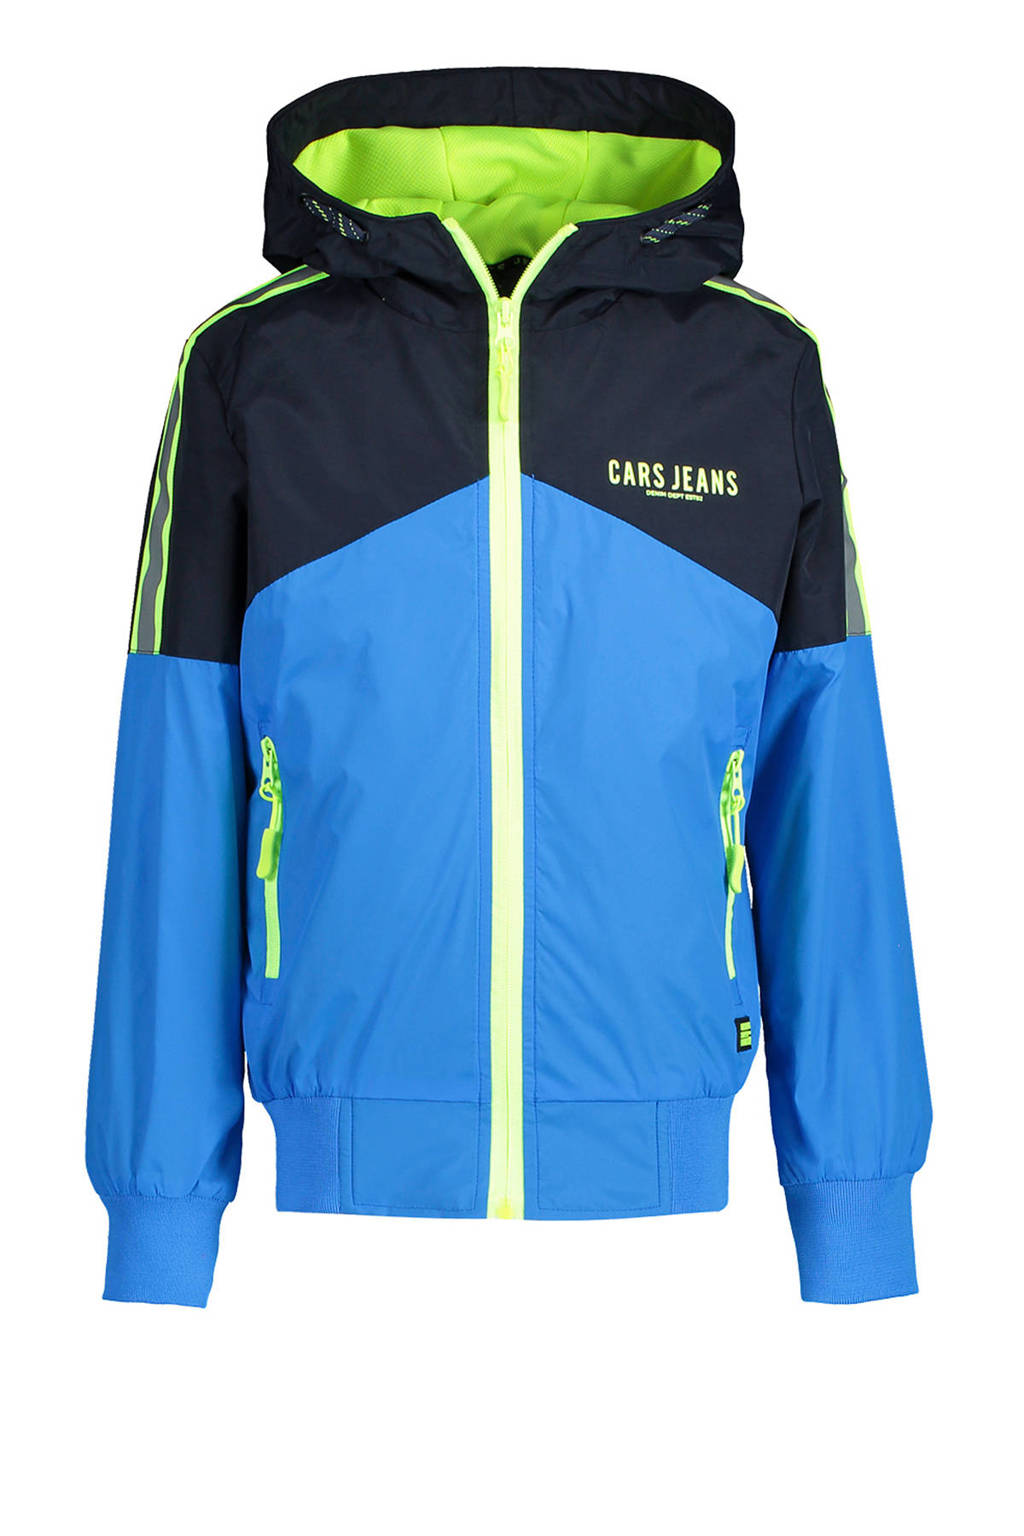 Cars zomerjas Conca kobaltblauw/zwart/neon geel, Kobaltblauw/zwart/neon geel